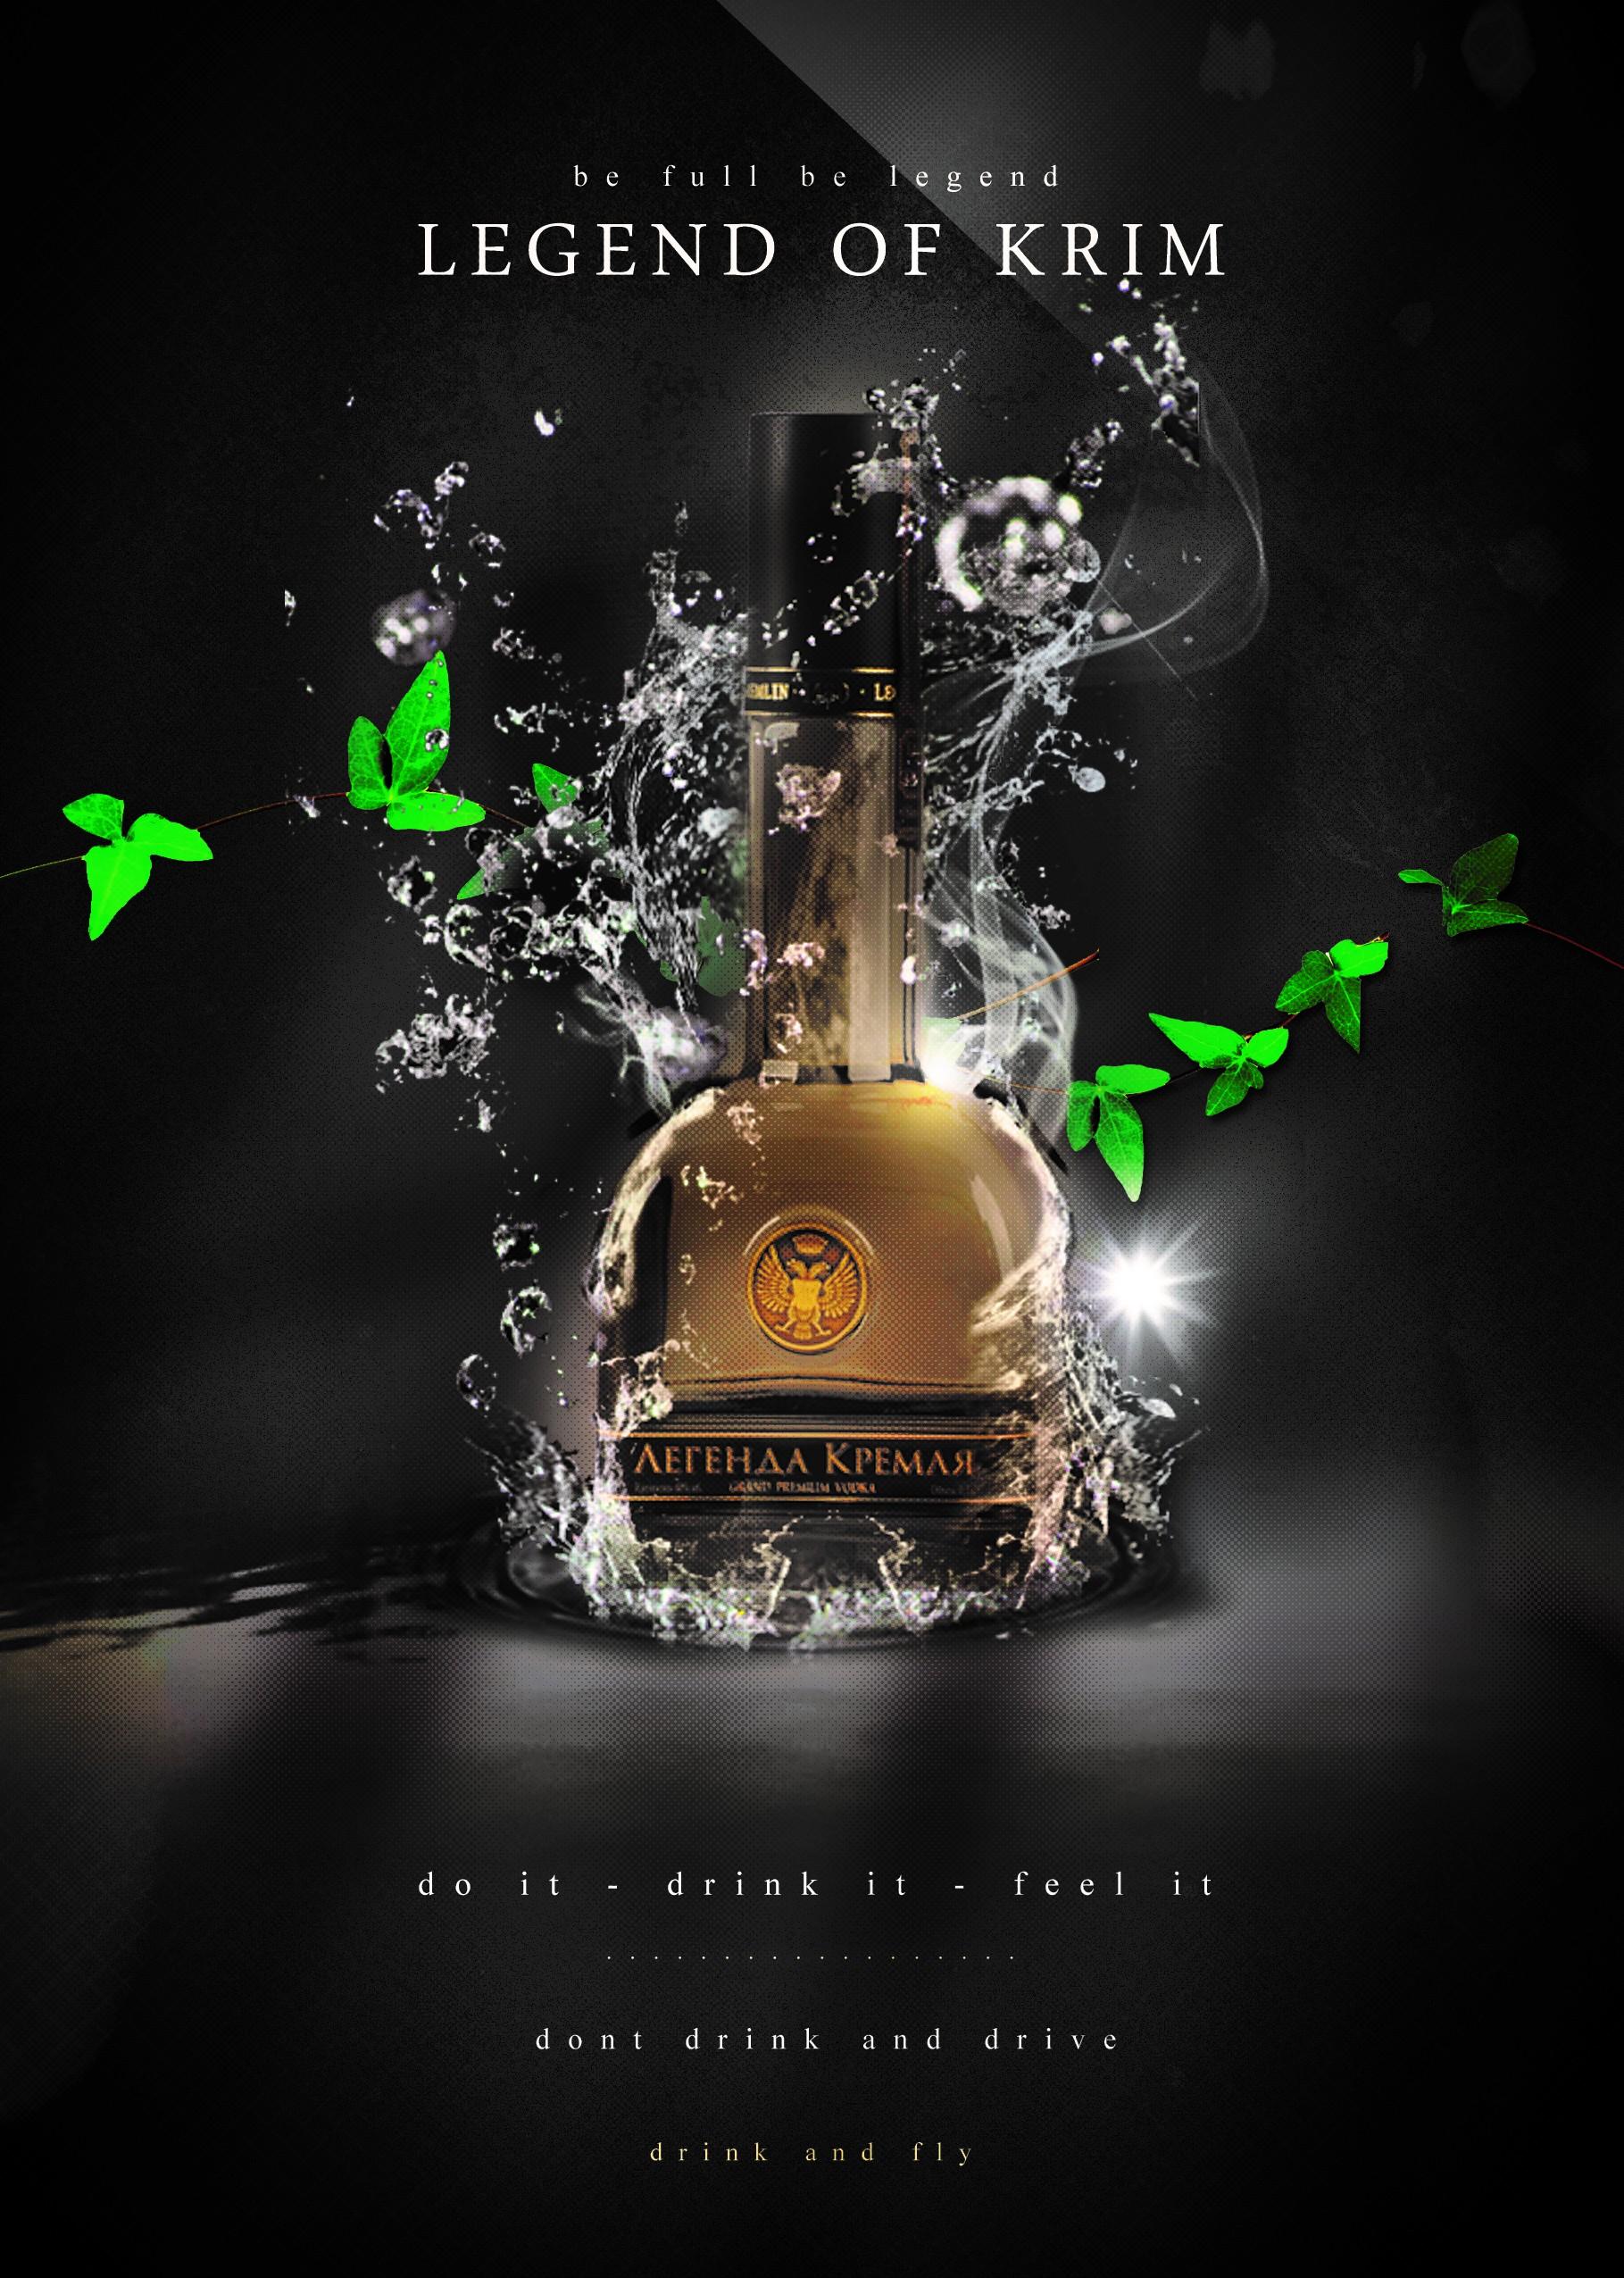 Gucci Wallpaper Hd Wallpaper Illustration Bottles Drink Alcohol Vodka